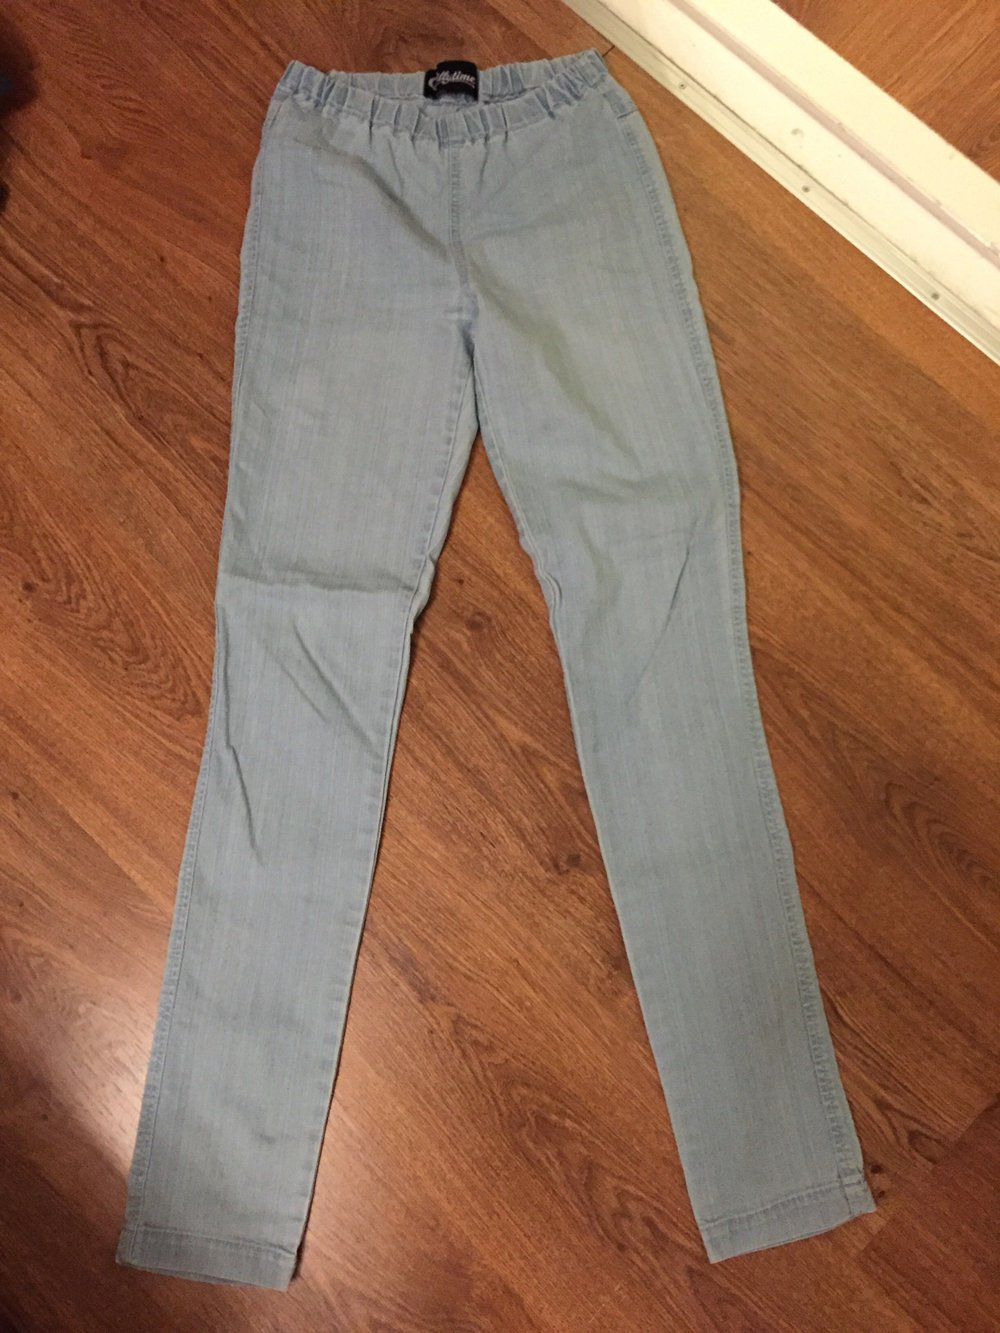 jeans treggings von chillytime otto versand. Black Bedroom Furniture Sets. Home Design Ideas